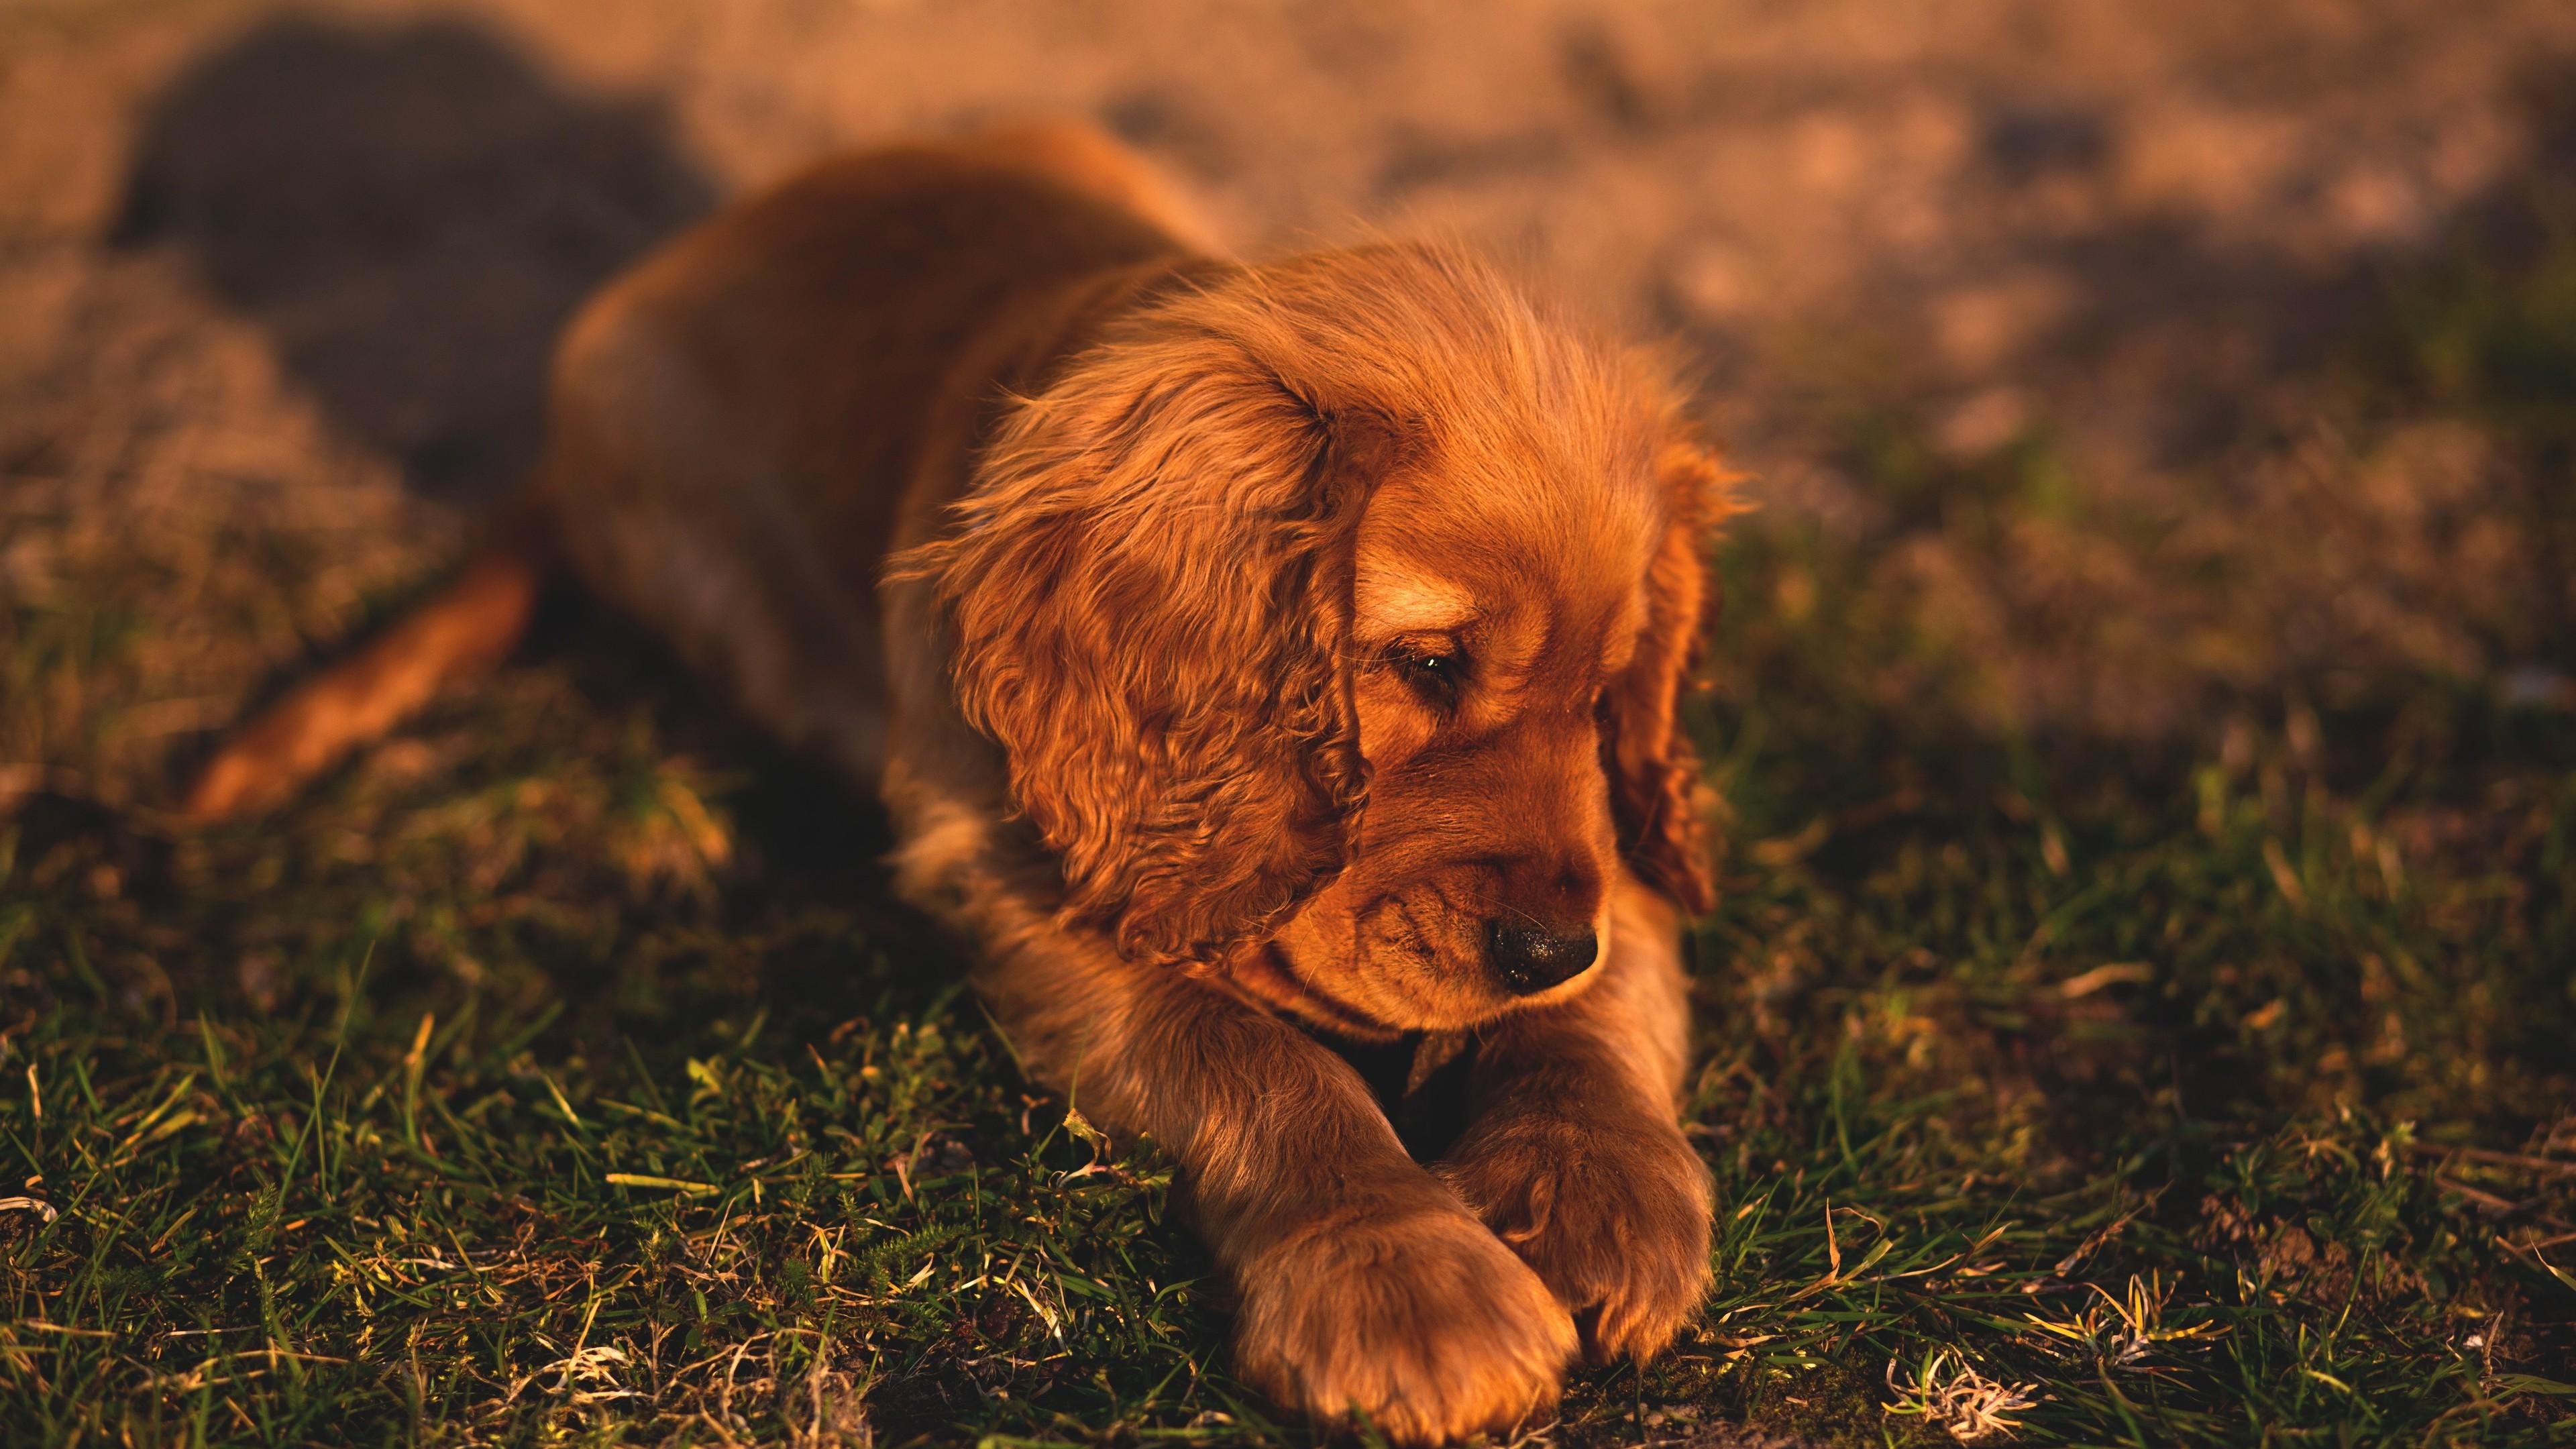 cute small puppy brown hairs 1542239087 - Cute Small Puppy Brown Hairs - puppy wallpapers, hd-wallpapers, hairs wallpapers, dog wallpapers, animals wallpapers, 4k-wallpapers